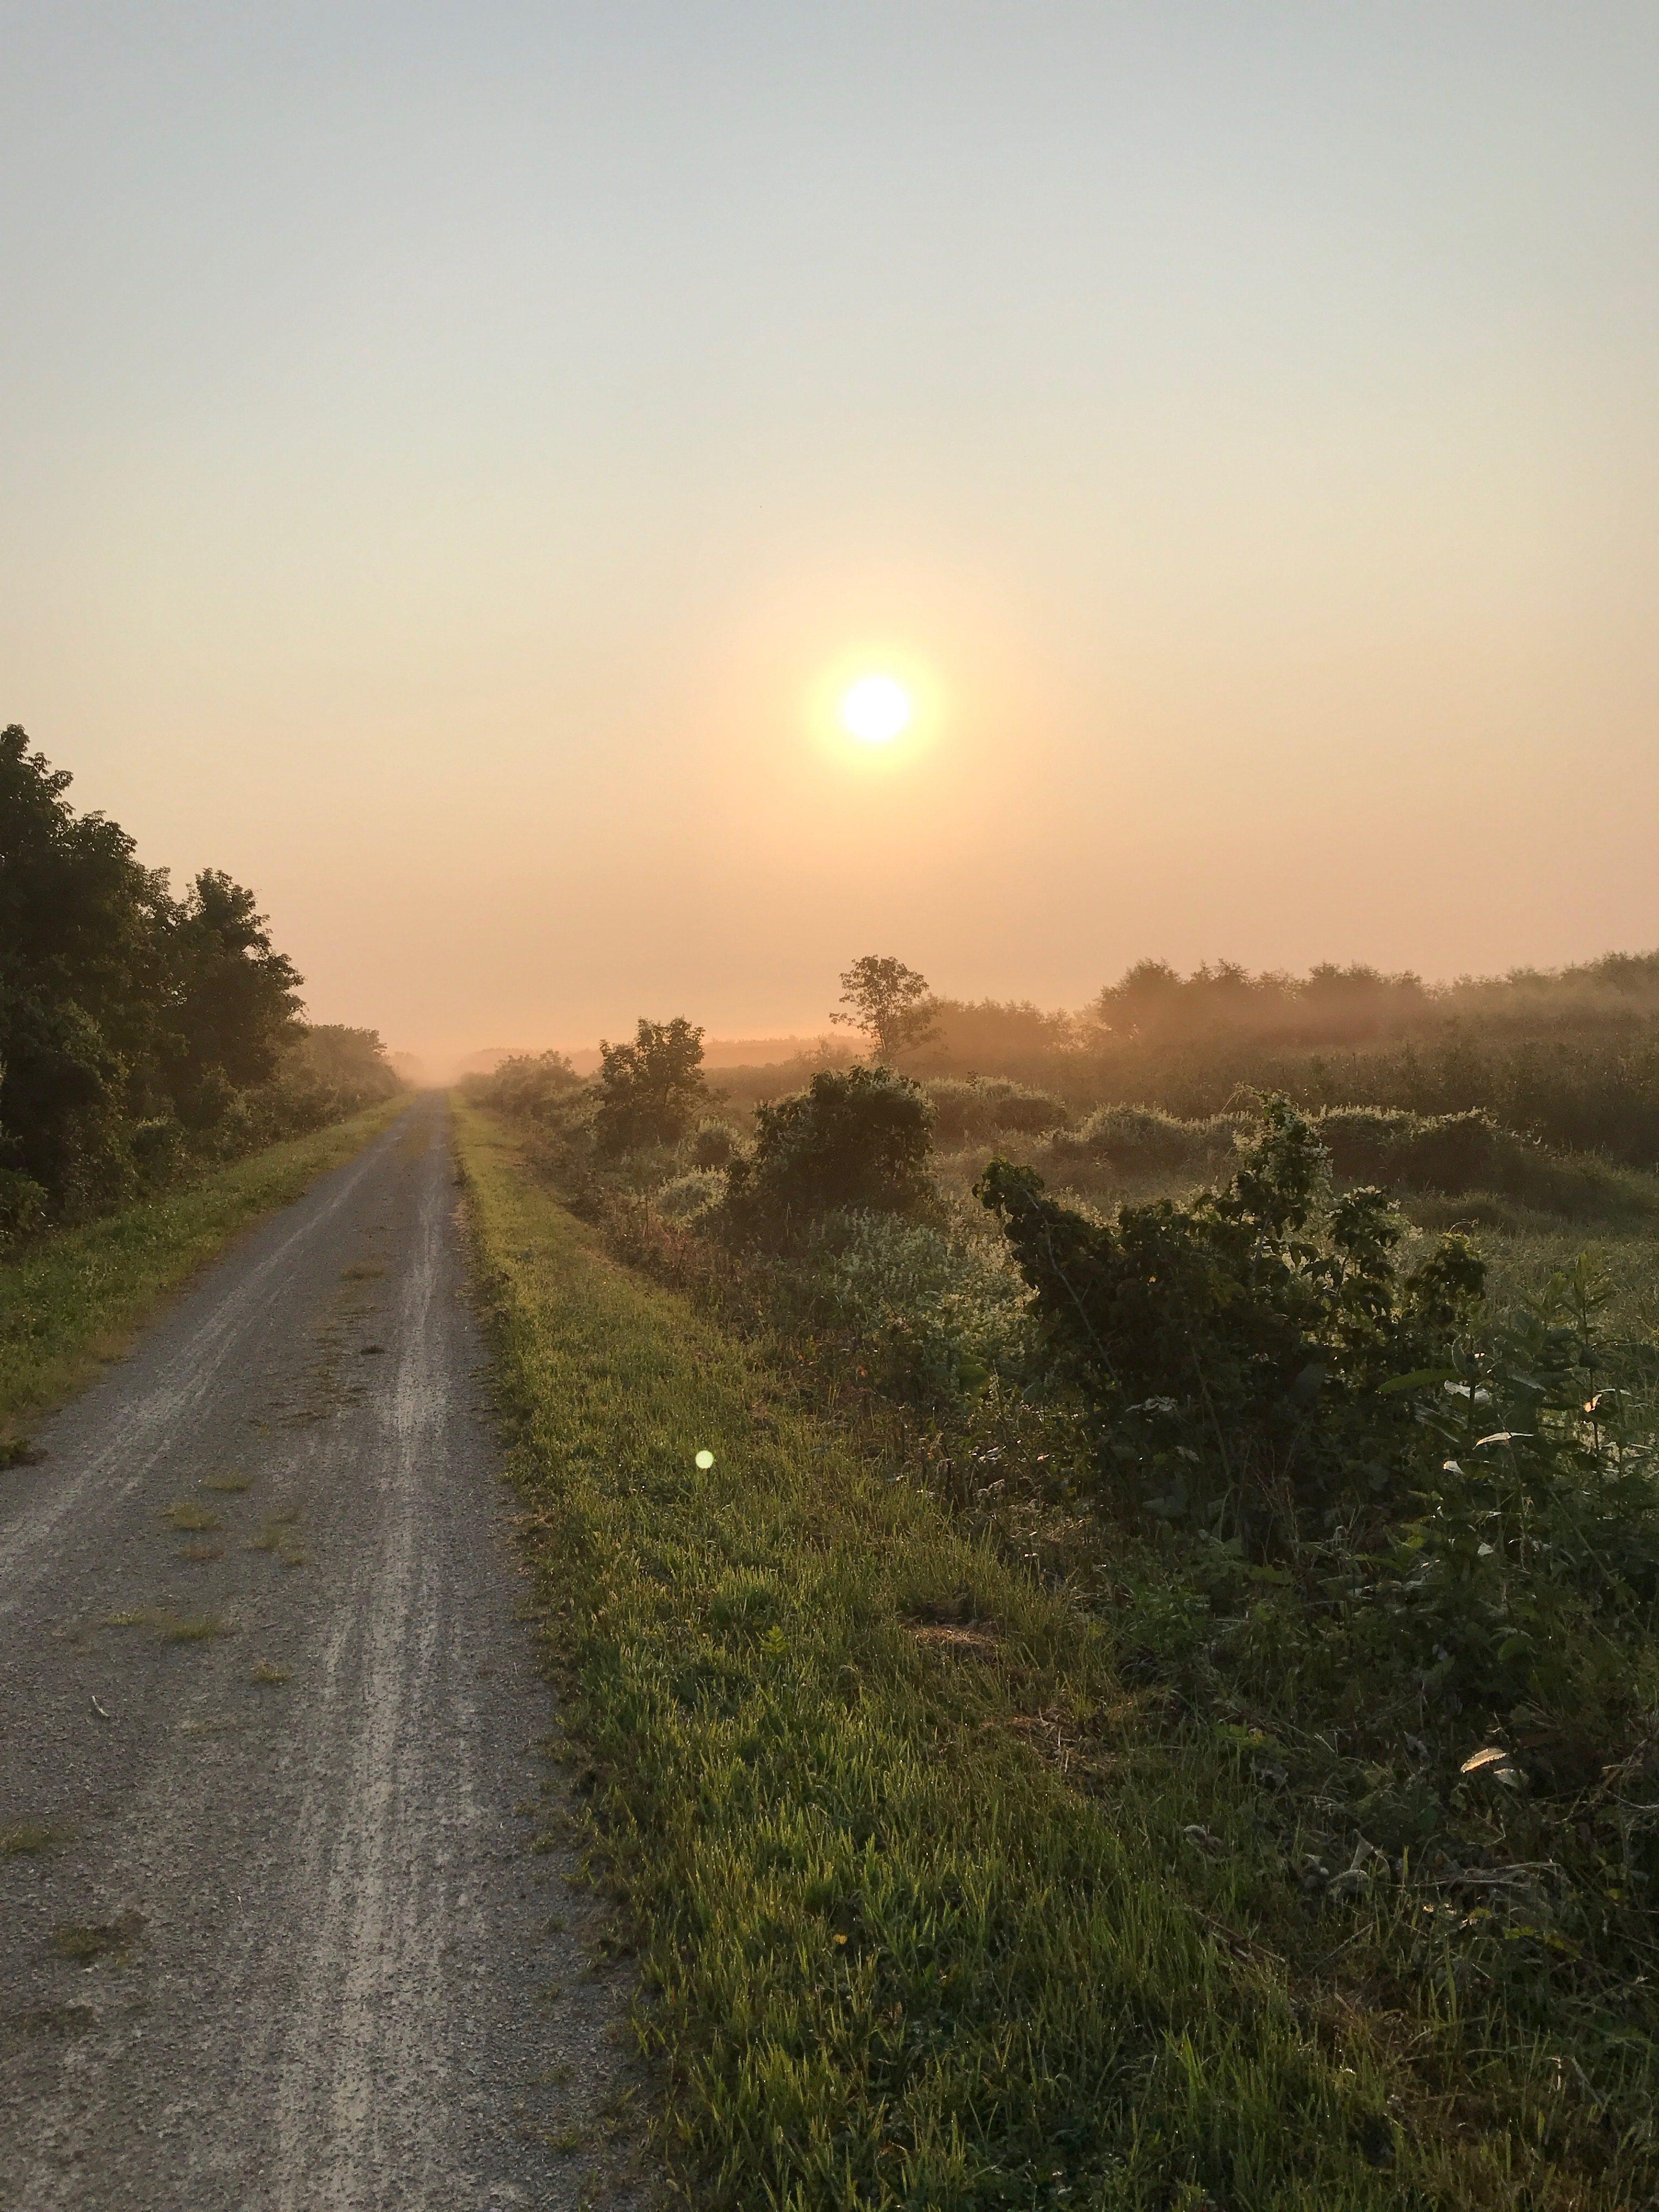 Blog 1: More than enough time